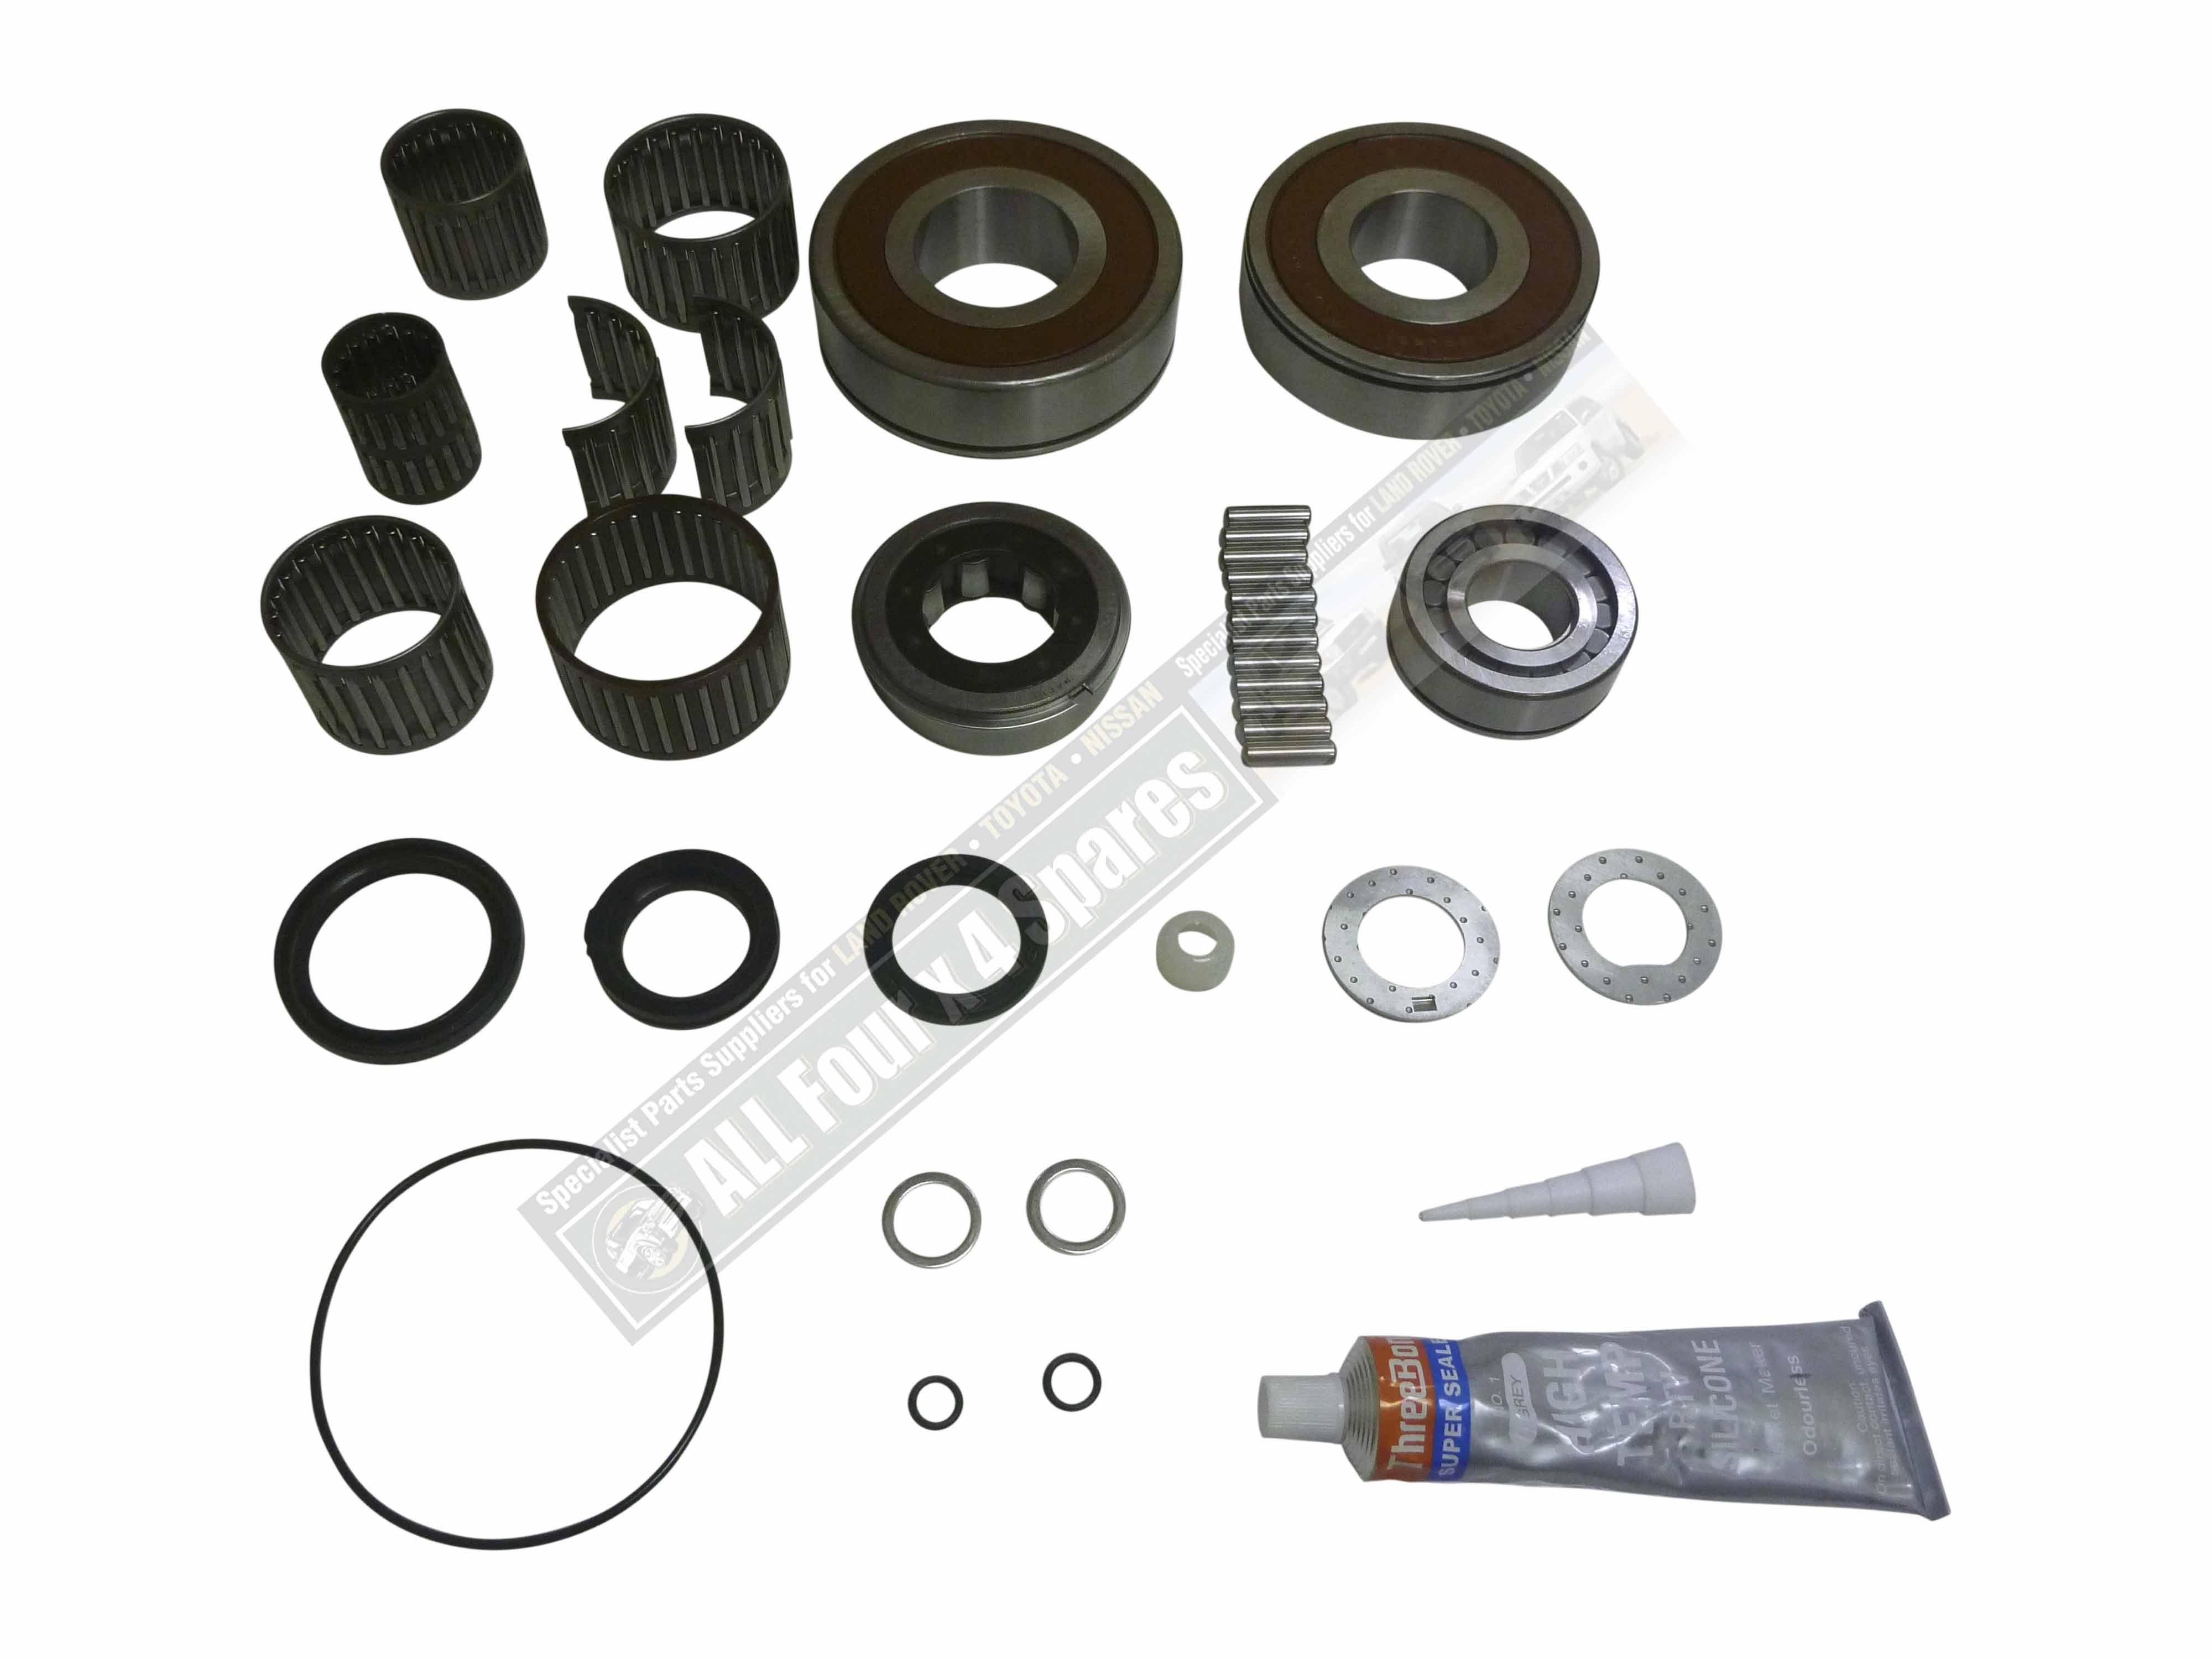 Gearbox-Bearing-Kit-Landcruiser-FZJ78-79-105-HDJ78-79-100-UZJ100-VDJ76-78-79